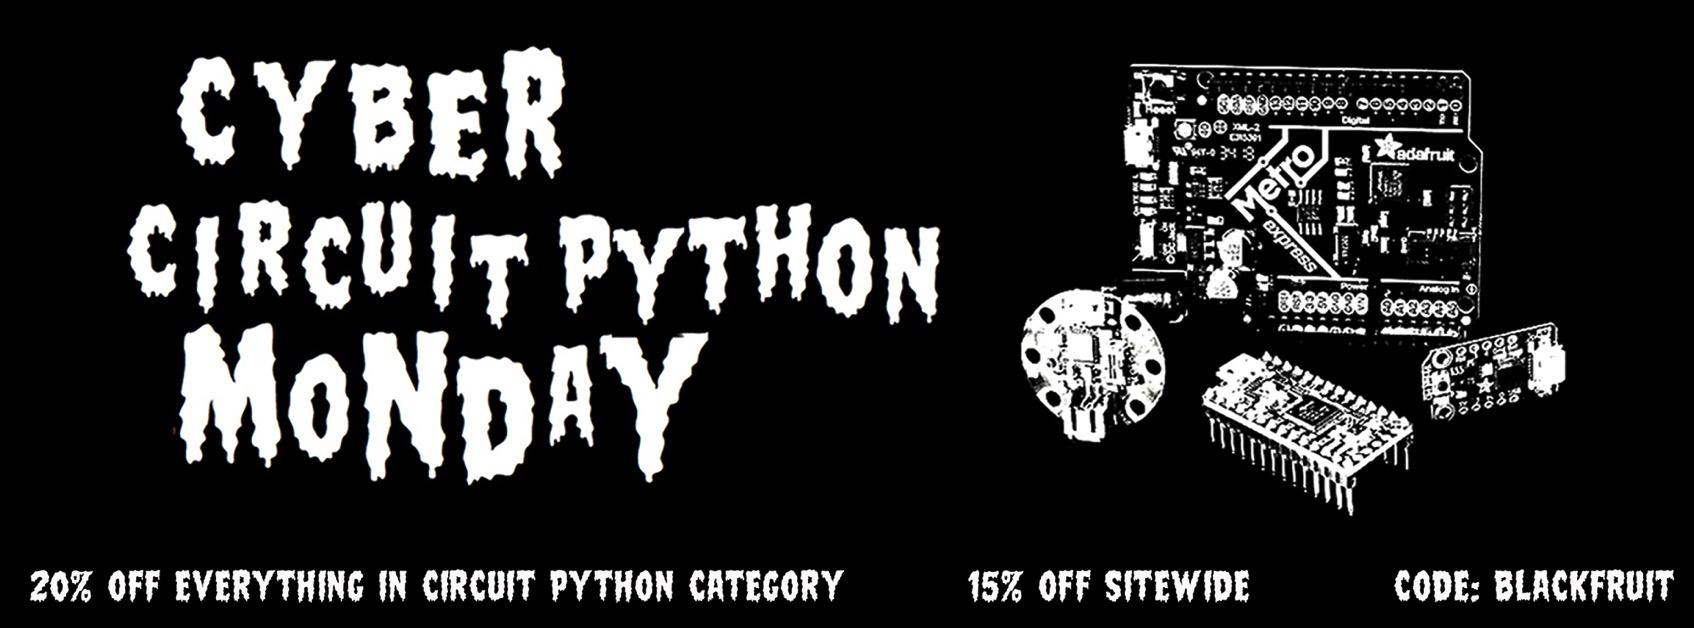 07 Cyber Circuit Python MondayMetal Facebook banner 02D ORIG 2018 11